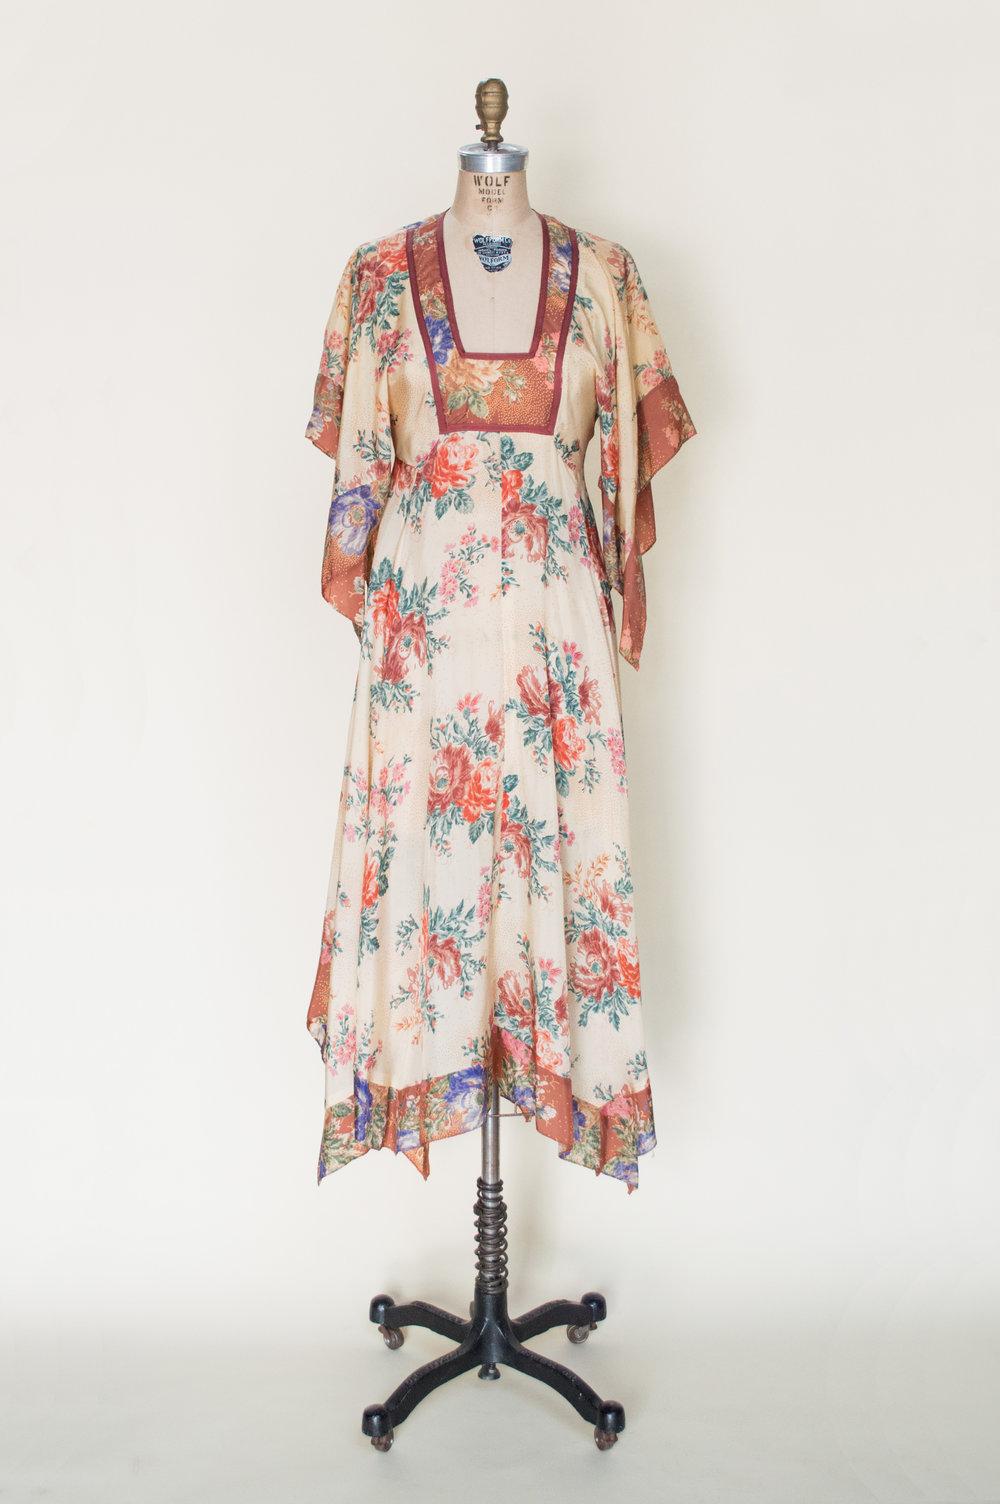 Sylvie Dress, $88